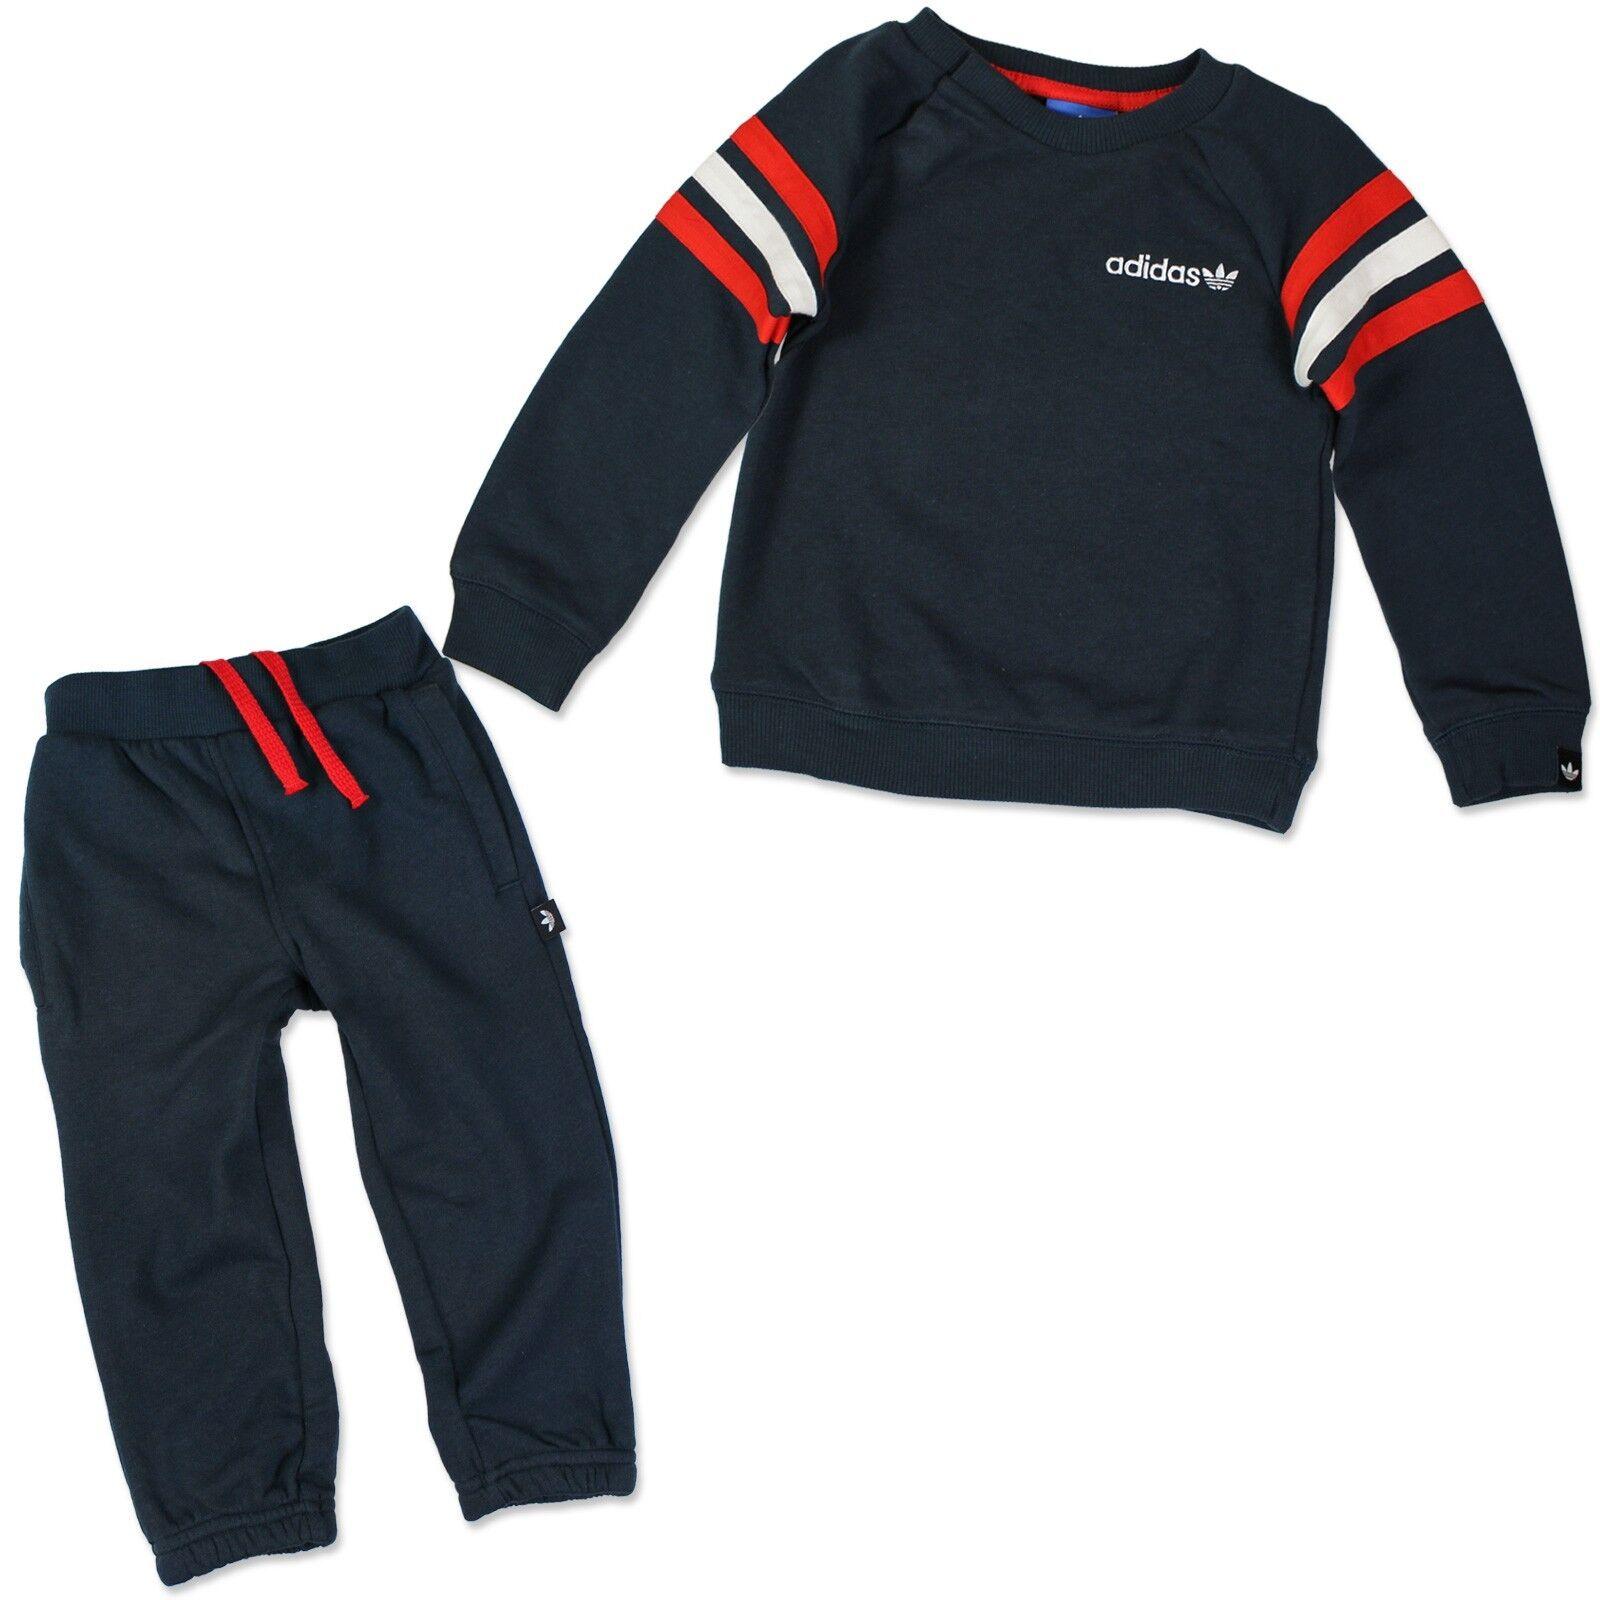 ADIDAS ORIGINALS ENFANTS Crew Jogger Jogging Suit Sweat Pantalon Bleu Rouge 80